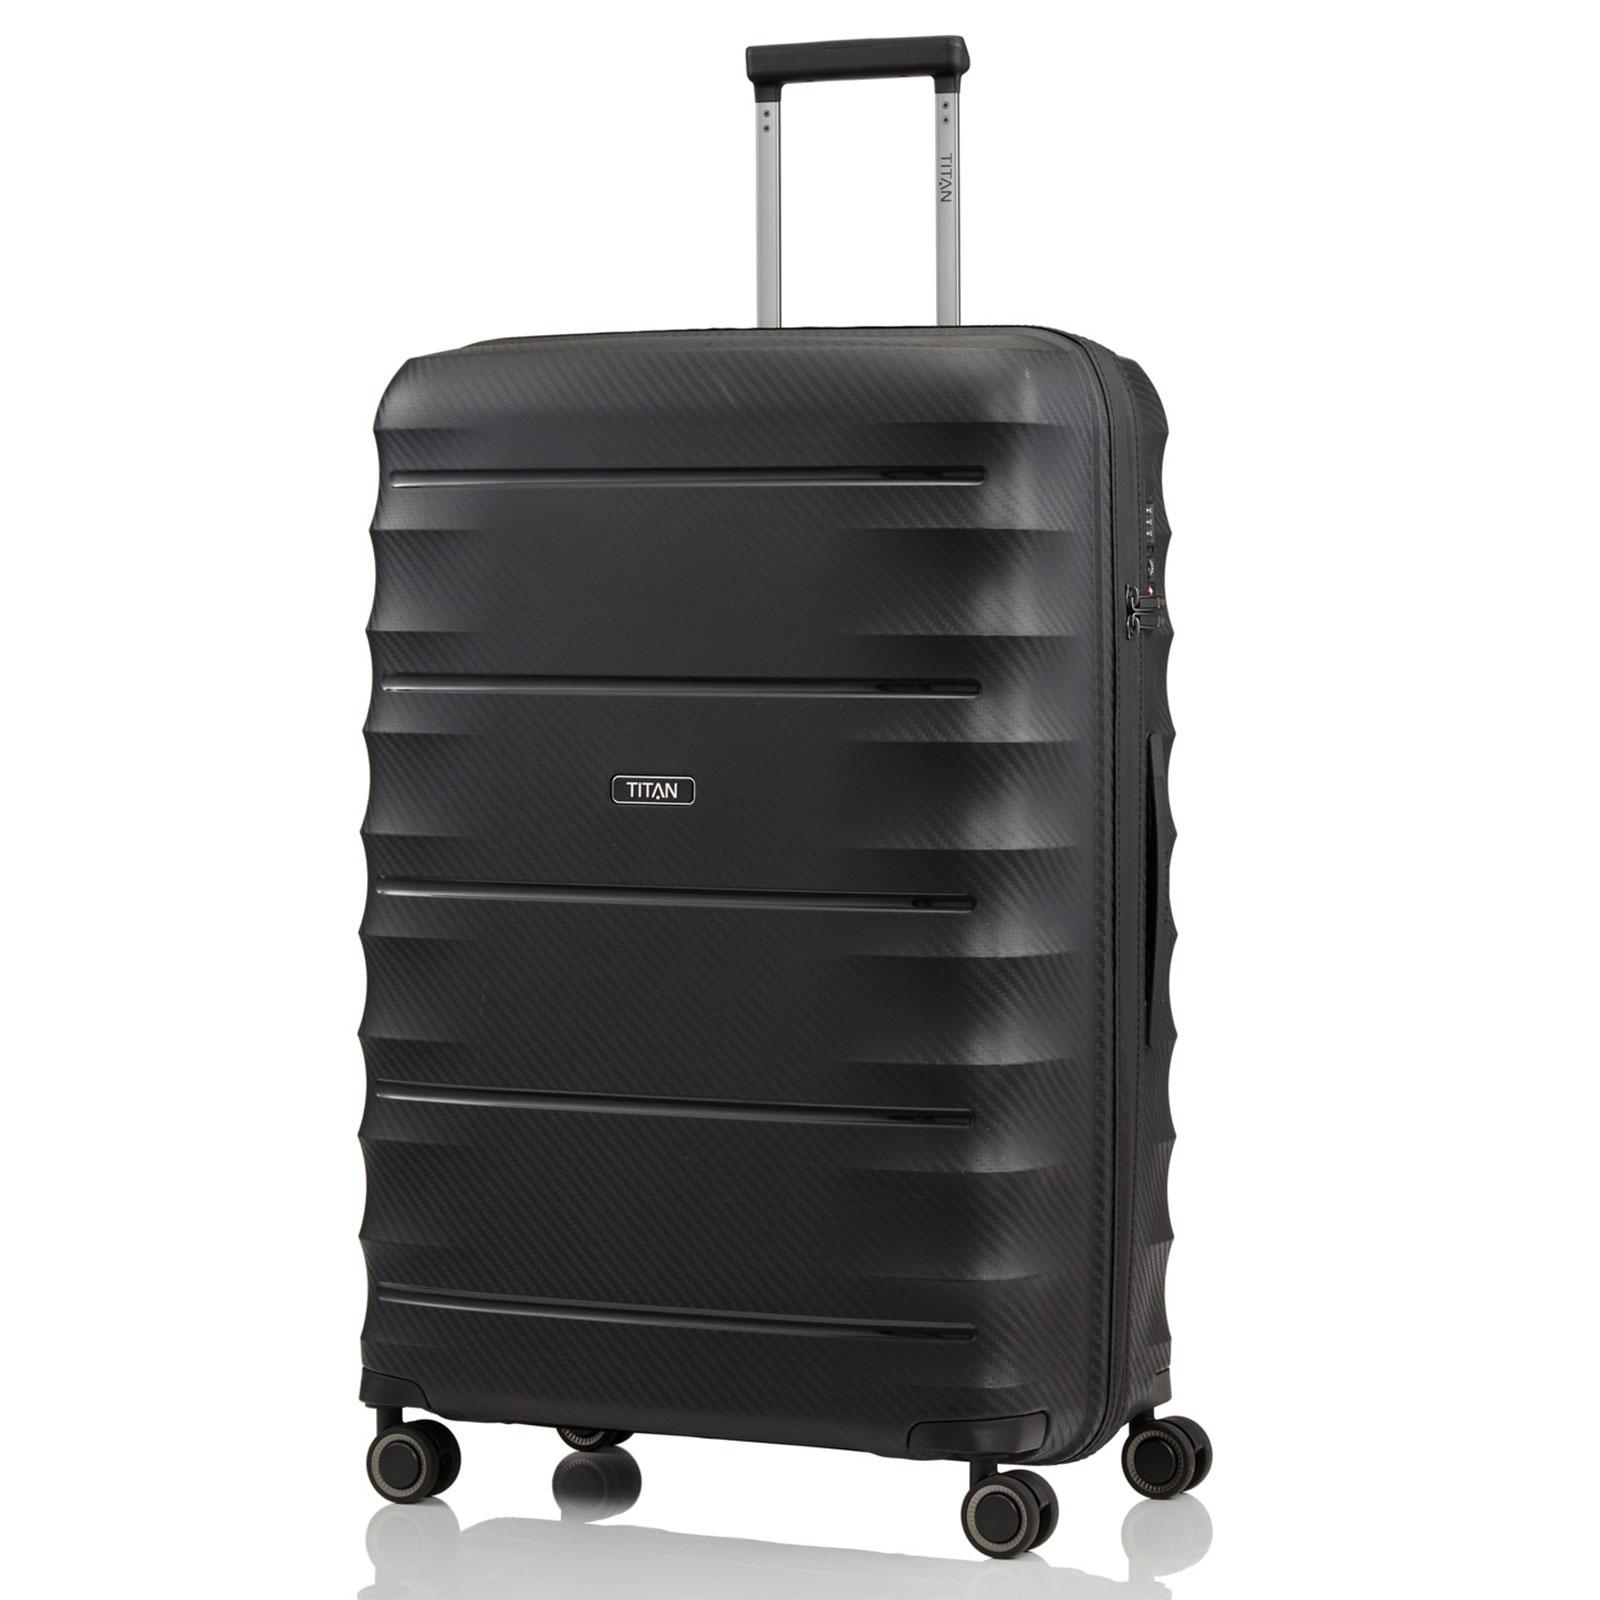 titan koffer g nstig kaufen koffermarkt. Black Bedroom Furniture Sets. Home Design Ideas